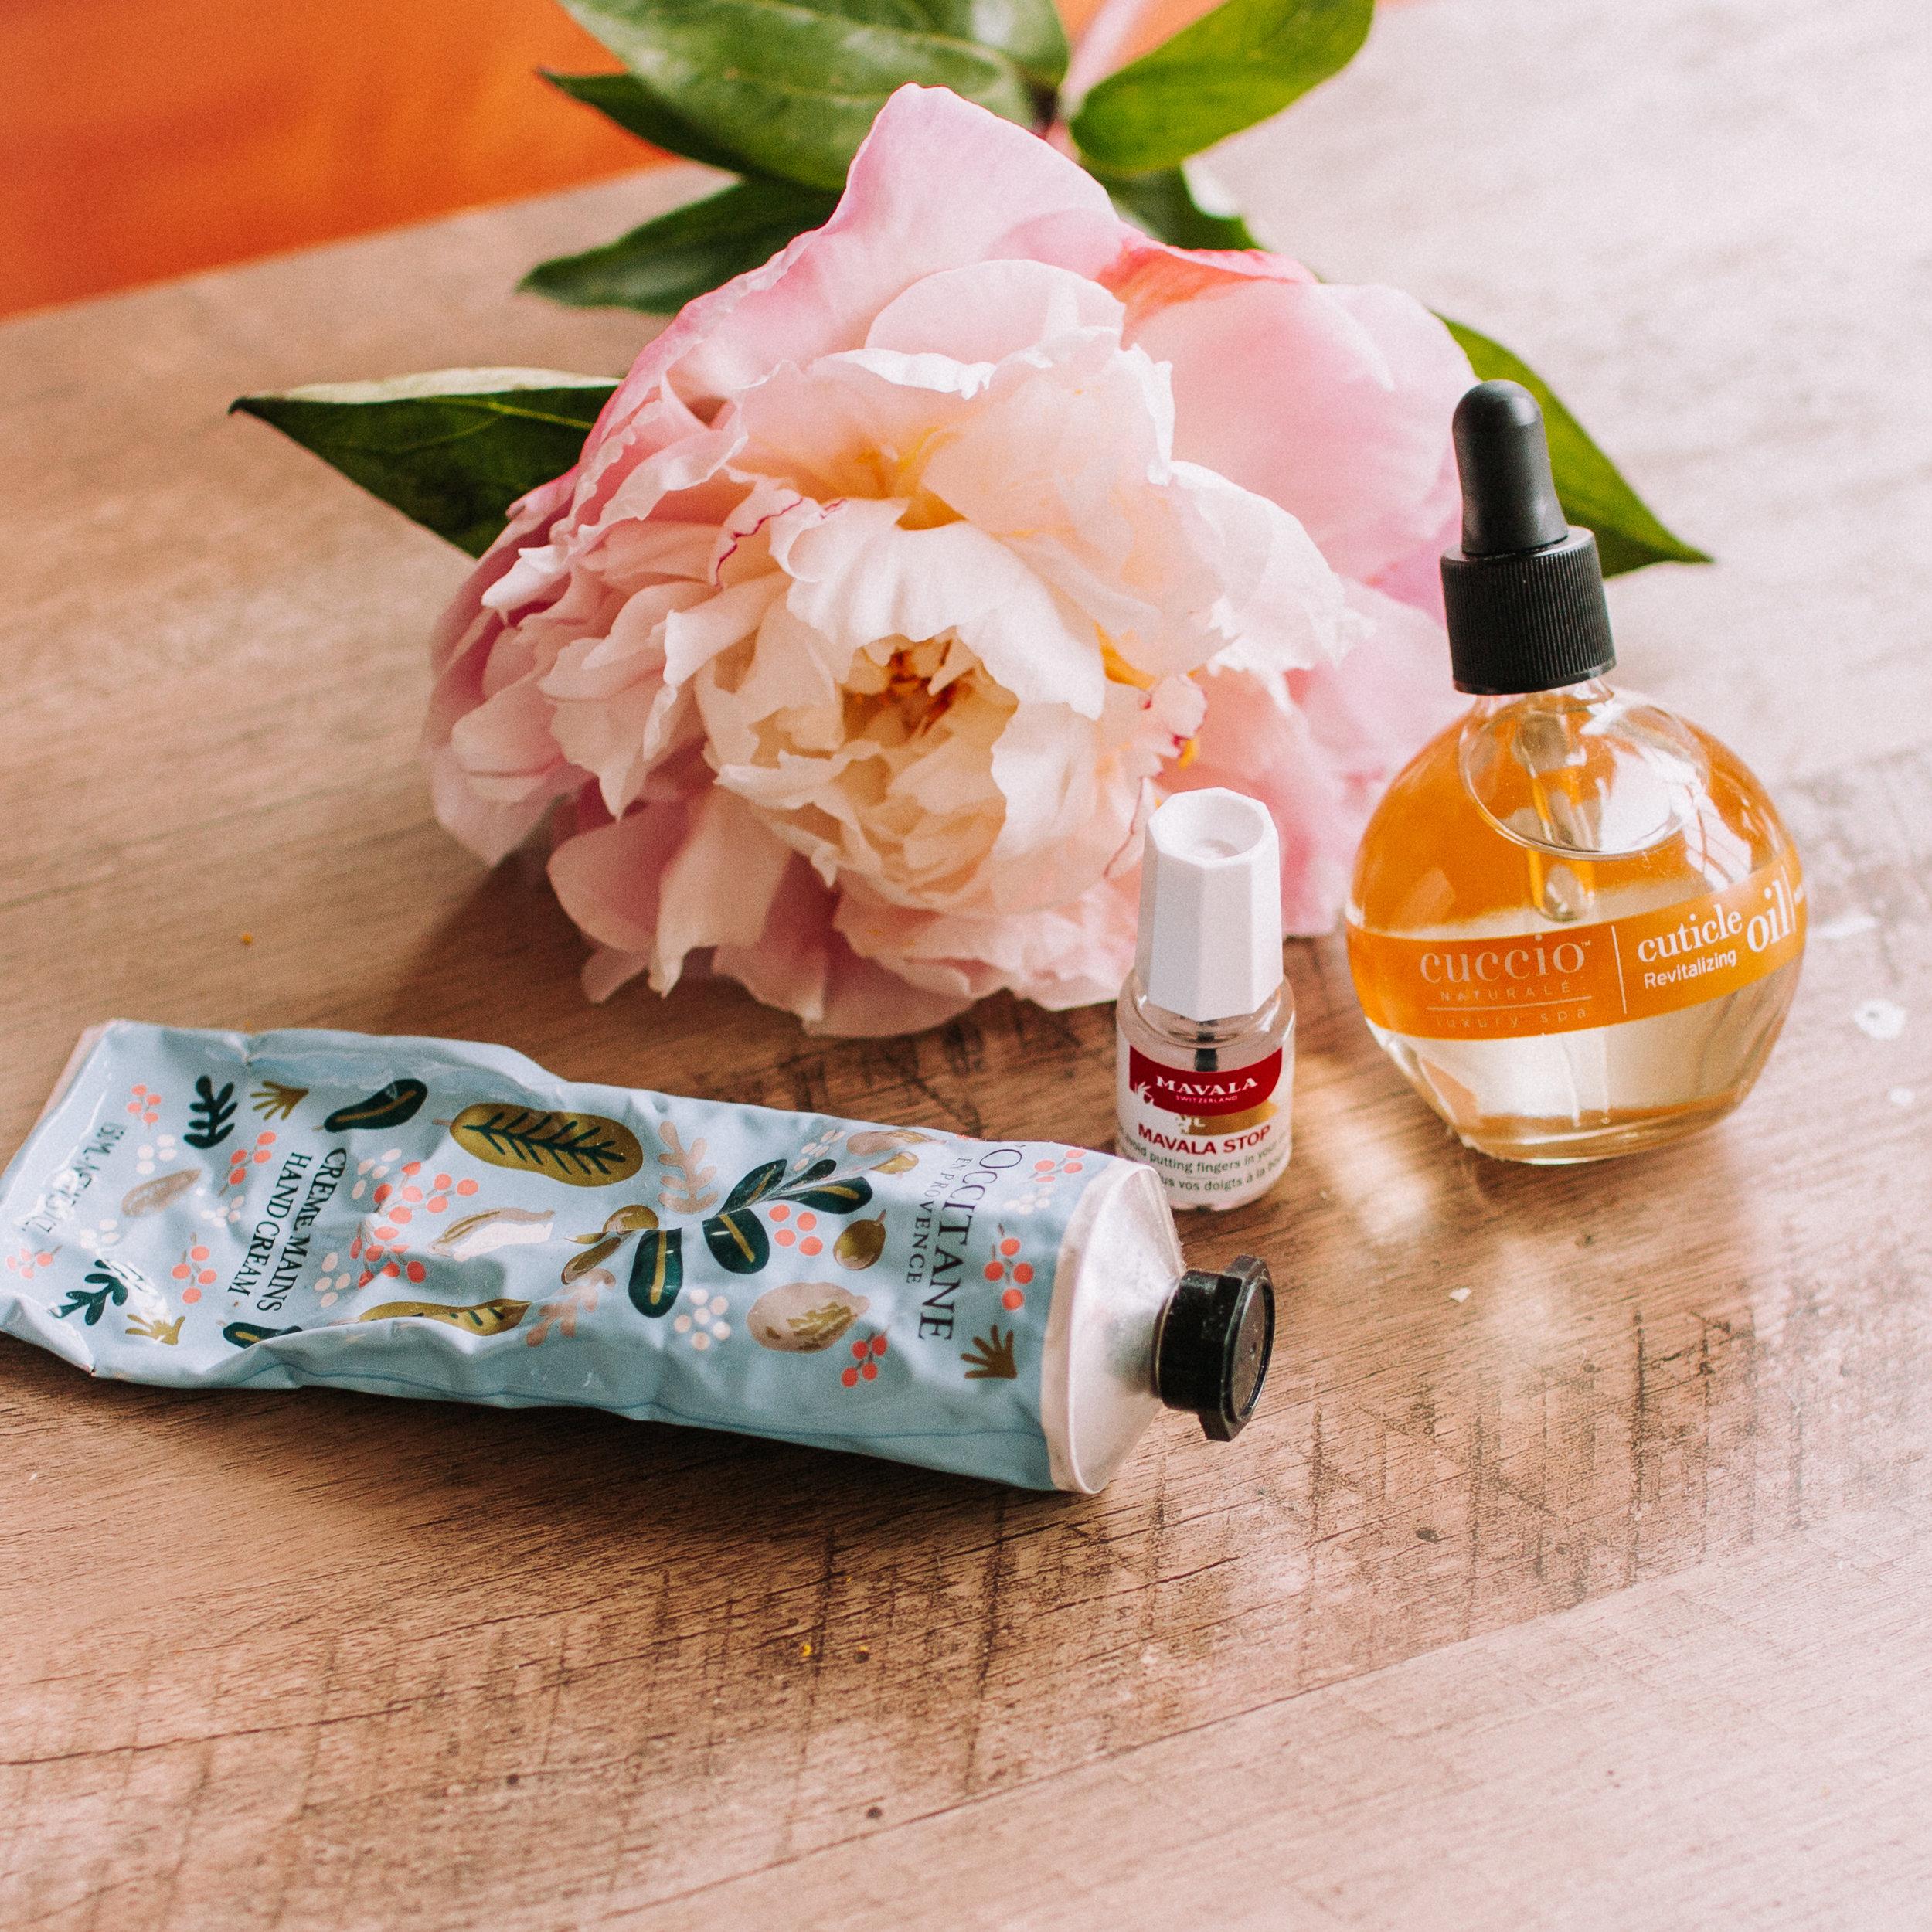 Mavala Stop nail biting, Cuticle Oil, L'Occitane Rifle Paper Co hand lotion